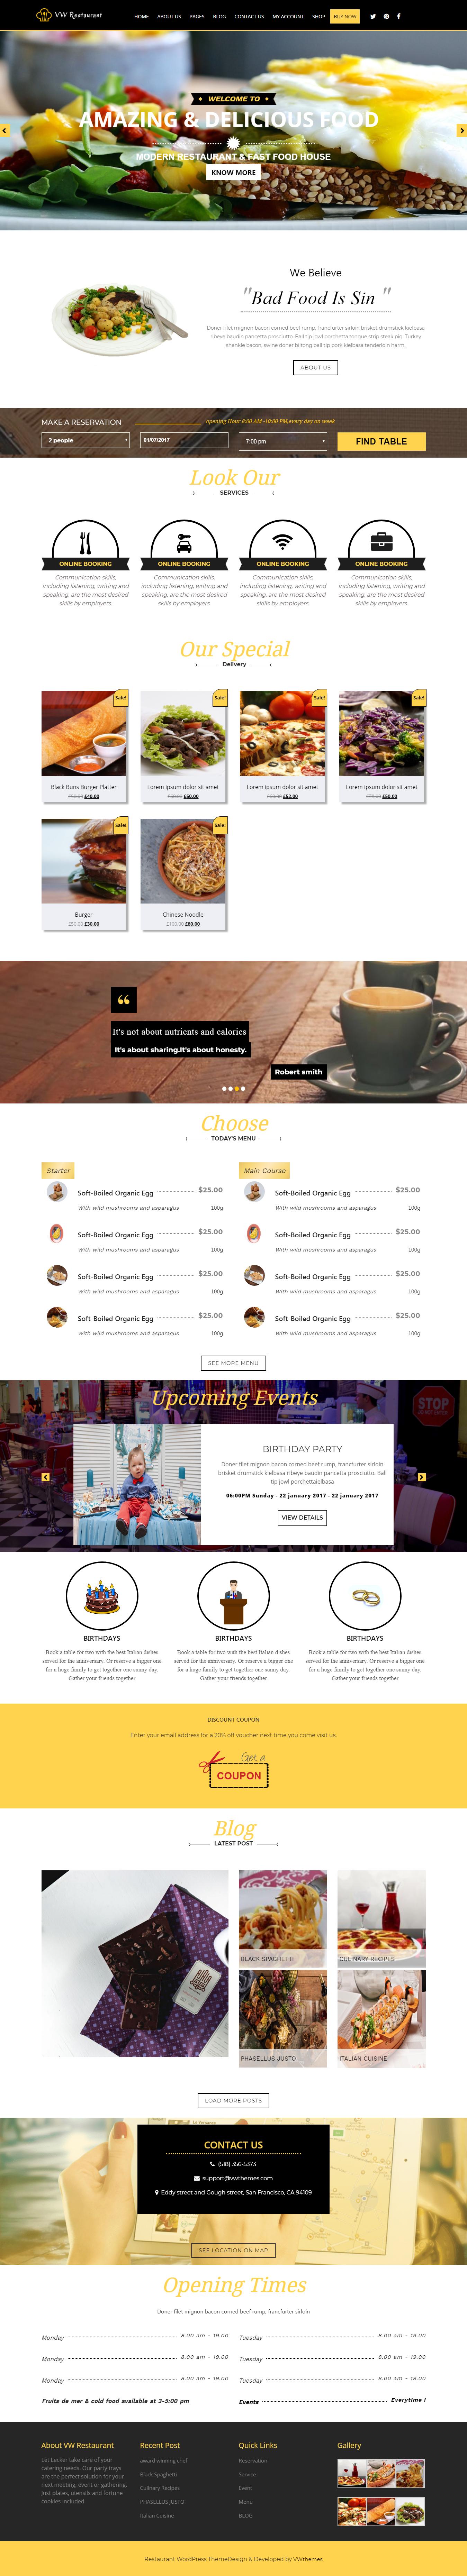 VW Restaurant Lite - El mejor tema gratuito de WordPress para restaurantes